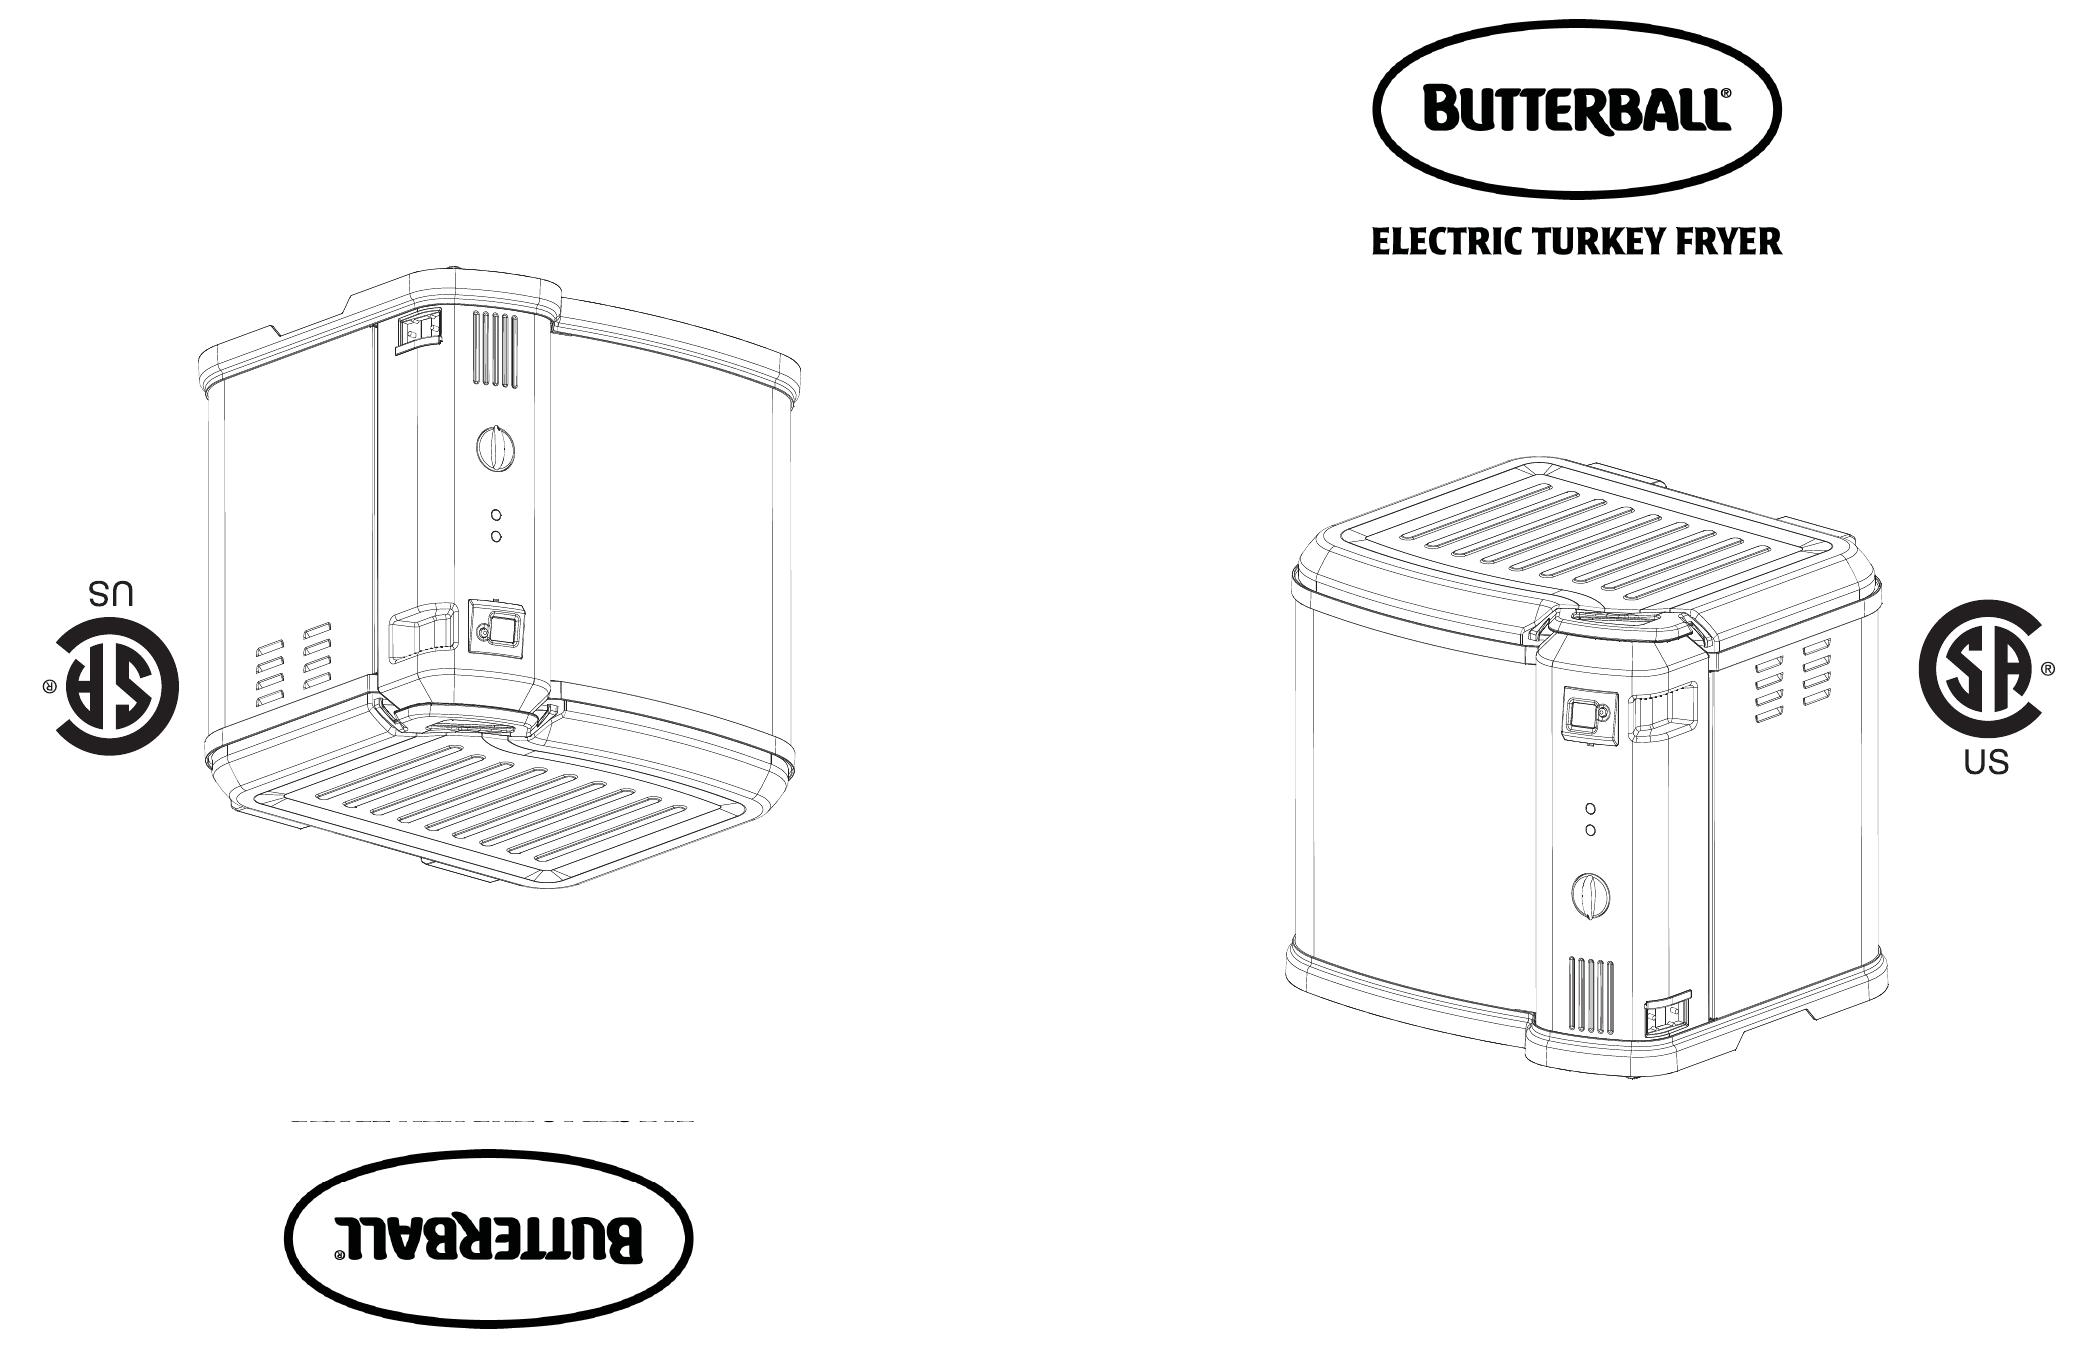 Masterbuilt Butterball XL Indoor Electric Turkey Fryer